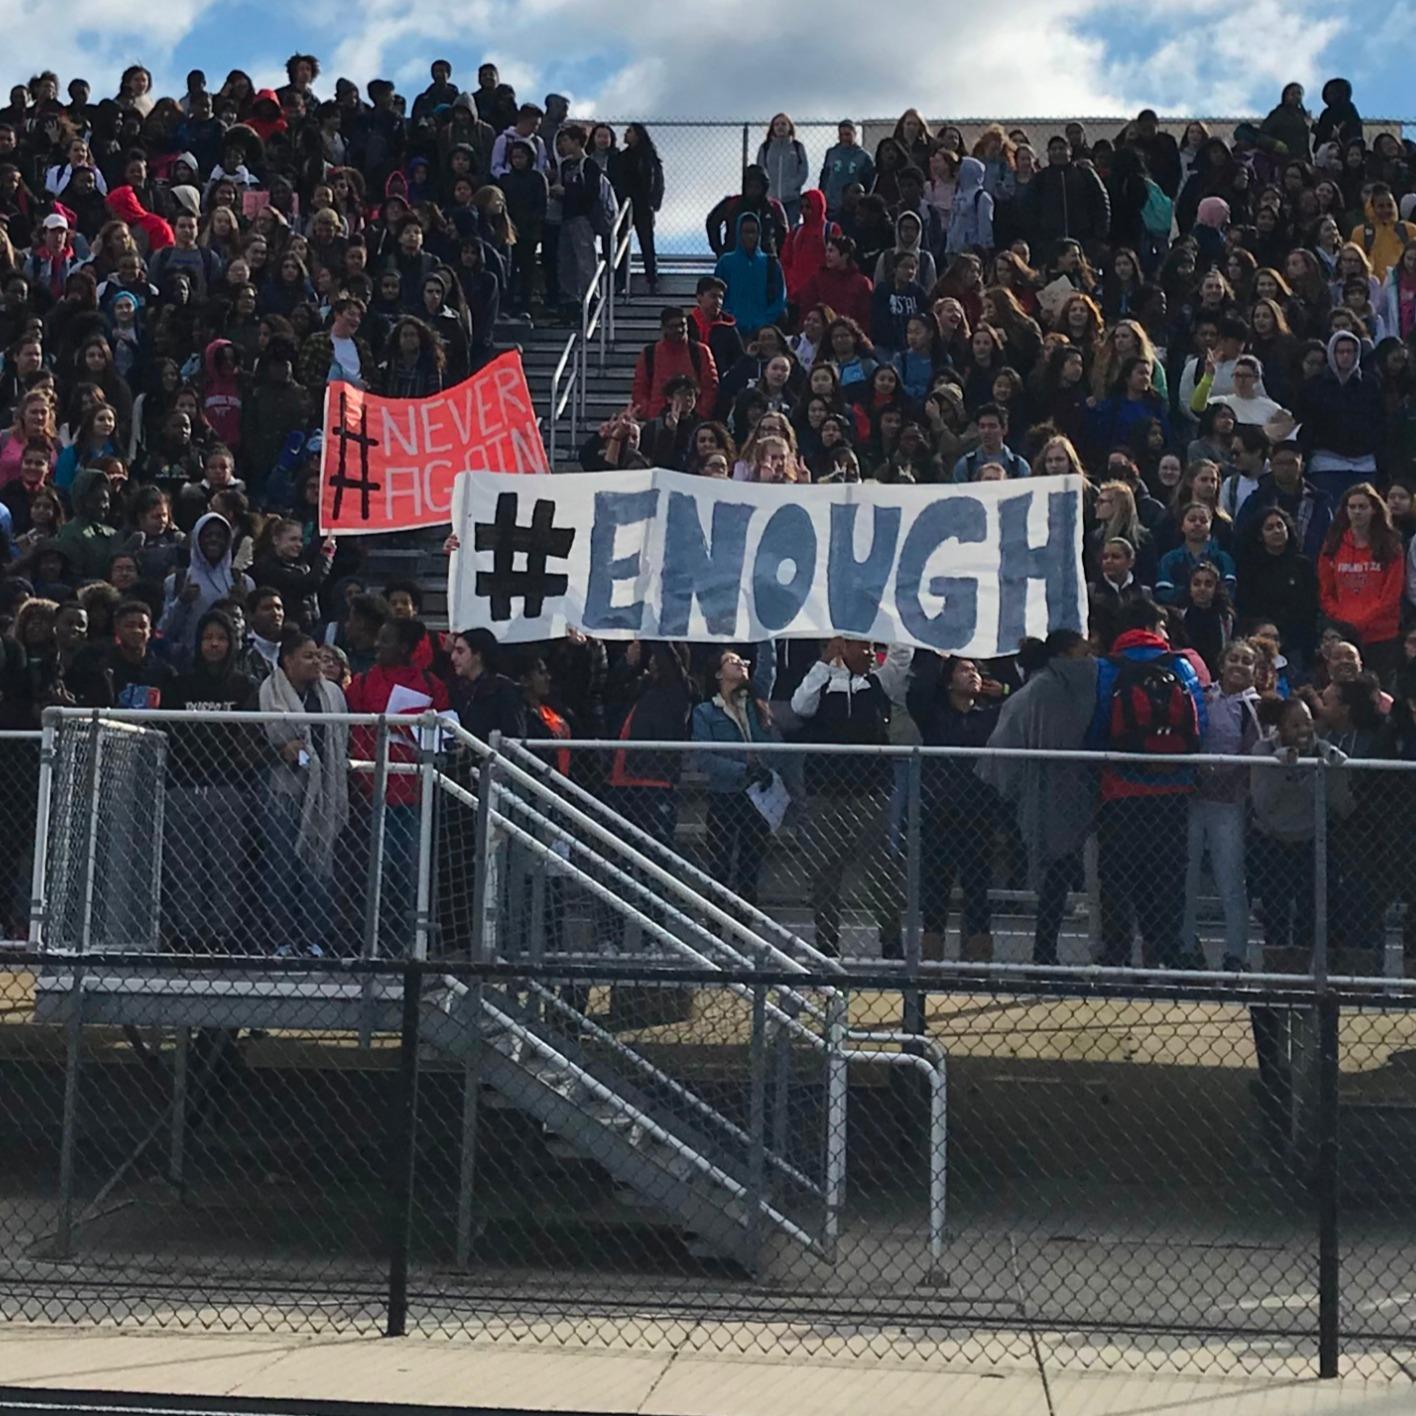 Wednesday Marks 17 Years Since Columbine High School: Clarksburg Students Stage 'Walkout' To Football Stadium